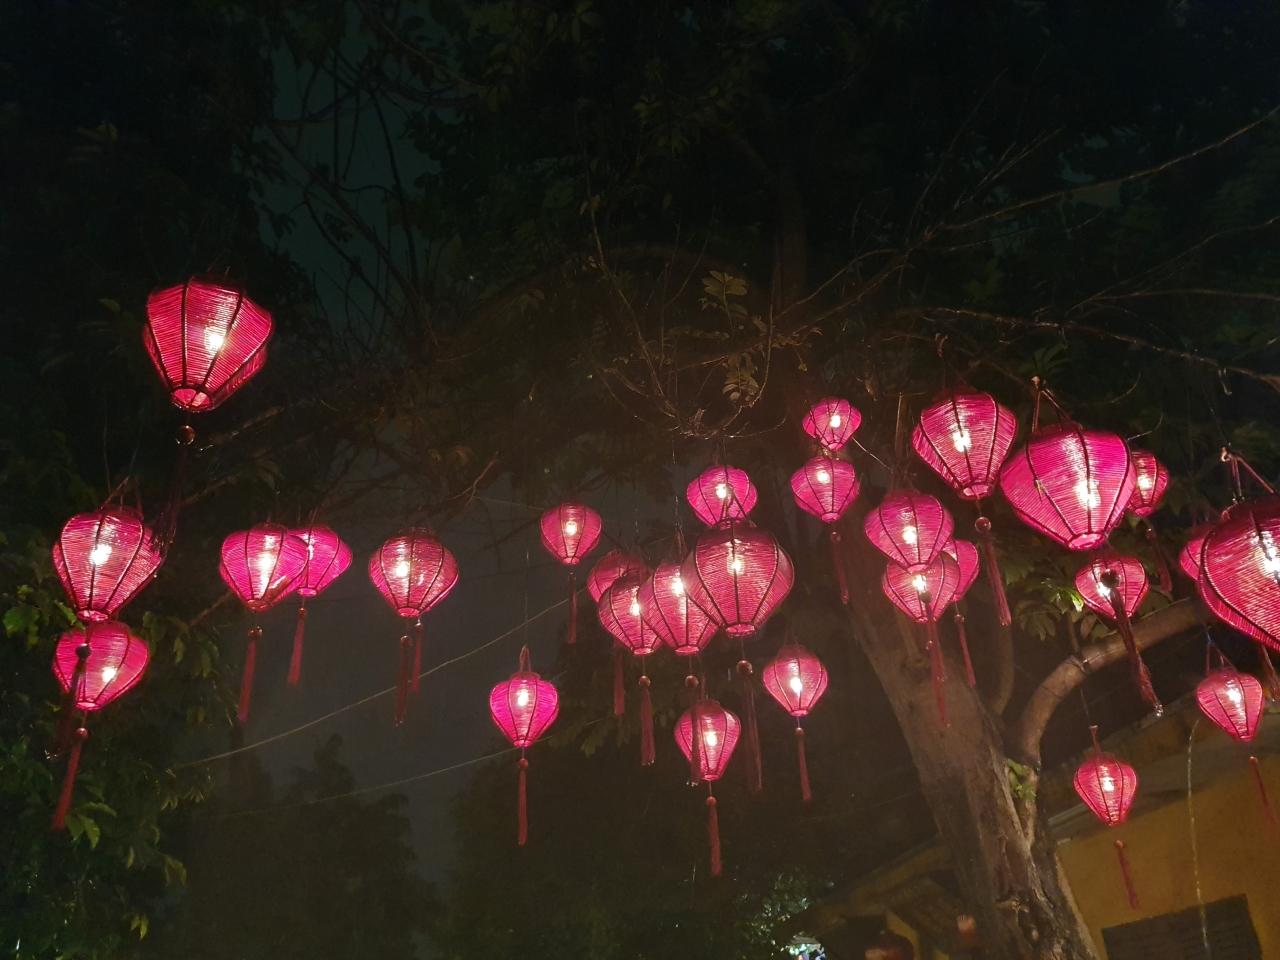 Evening 71: The Full Moon Festival of Lanterns andLight